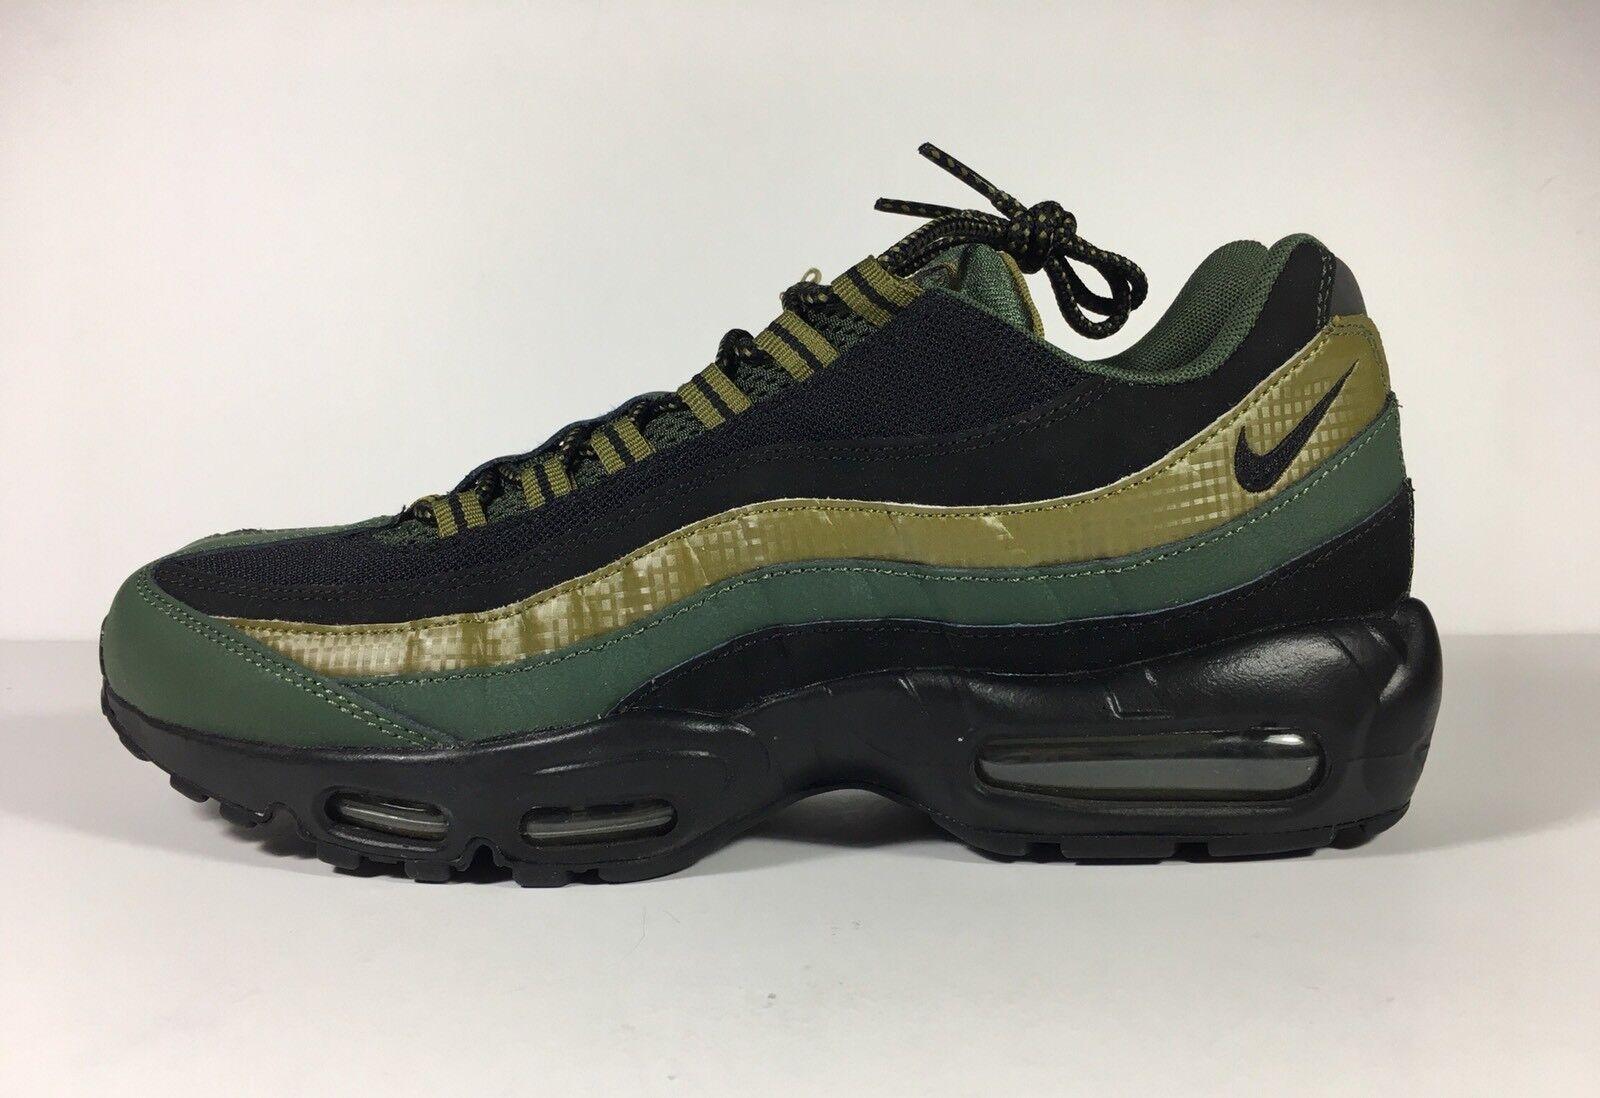 Nike Air Max 95 Essential Carbon Green   Black Size 9 749766 300